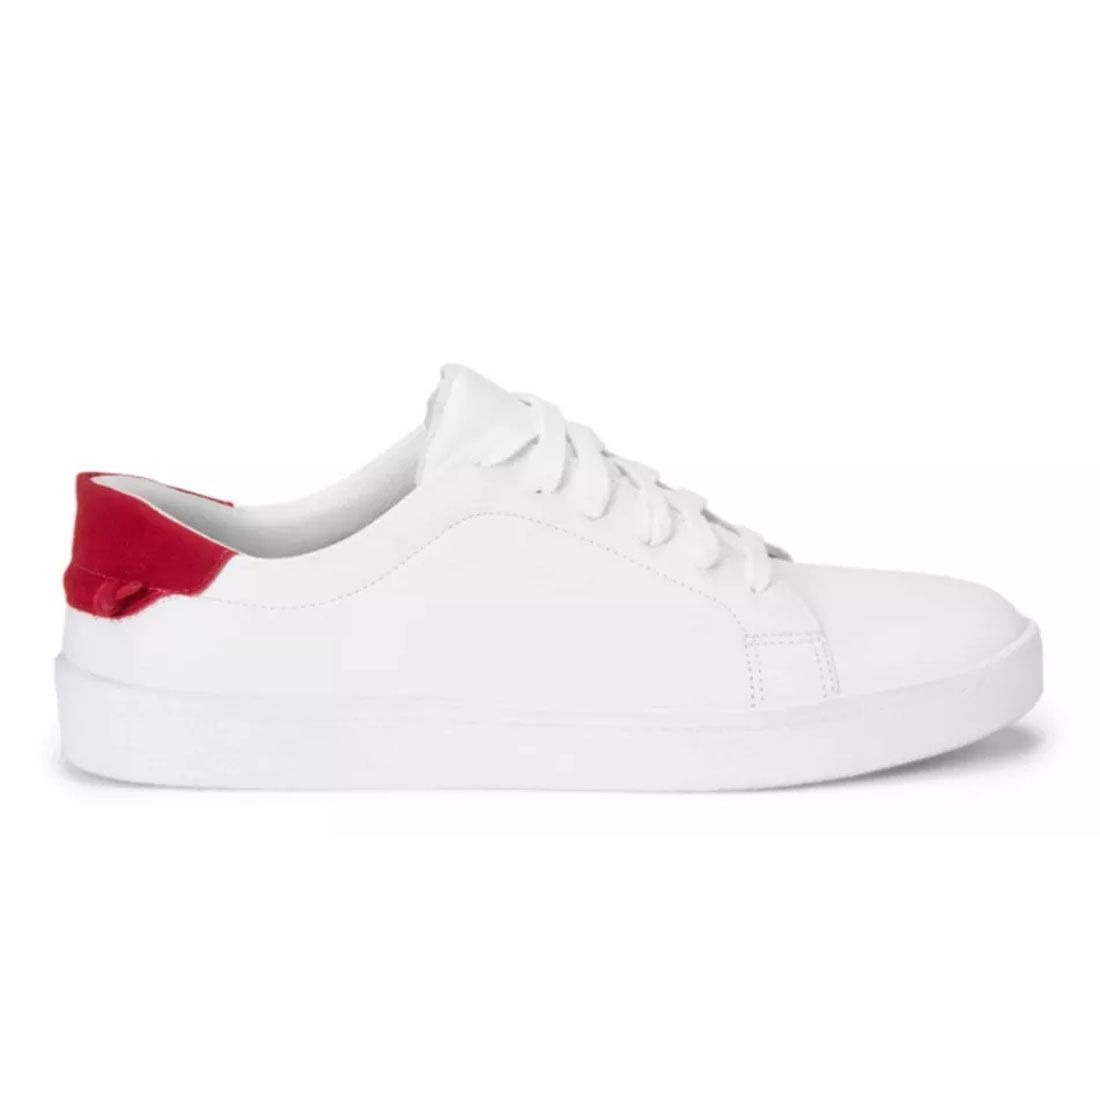 8451520eae tênis amaro recorte colorido vermelho   branco n 38. Carregando zoom.